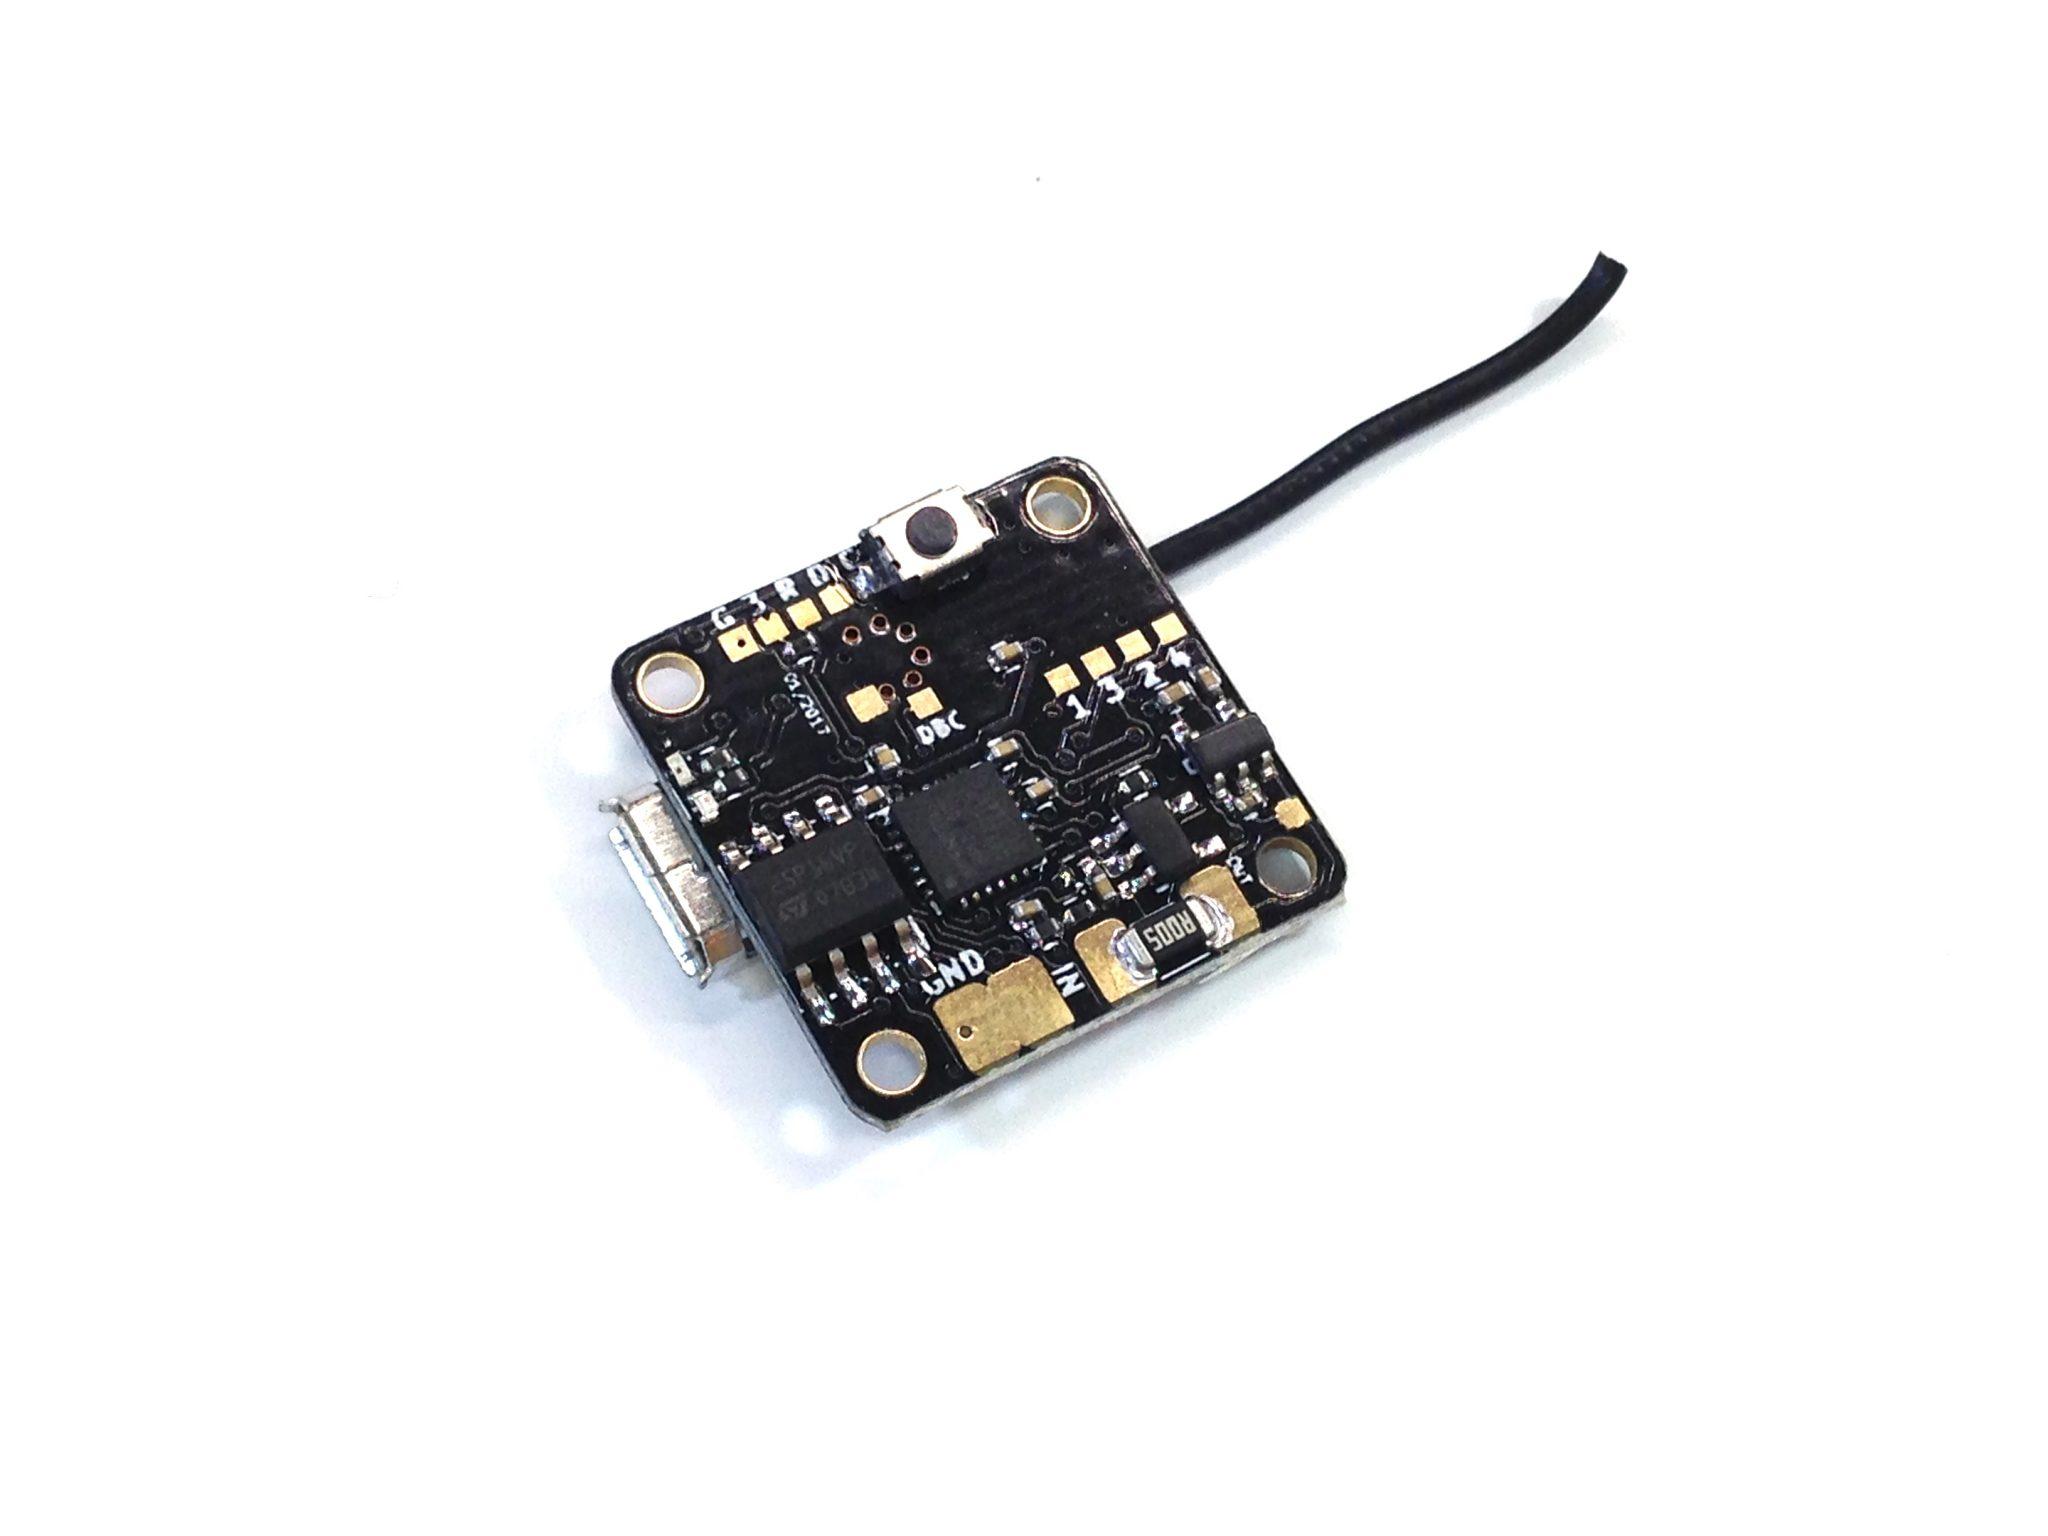 TinyFish F3 Flight Controller with FrSky receiver - Betaflight - DSHOT - (16x16mm mount)